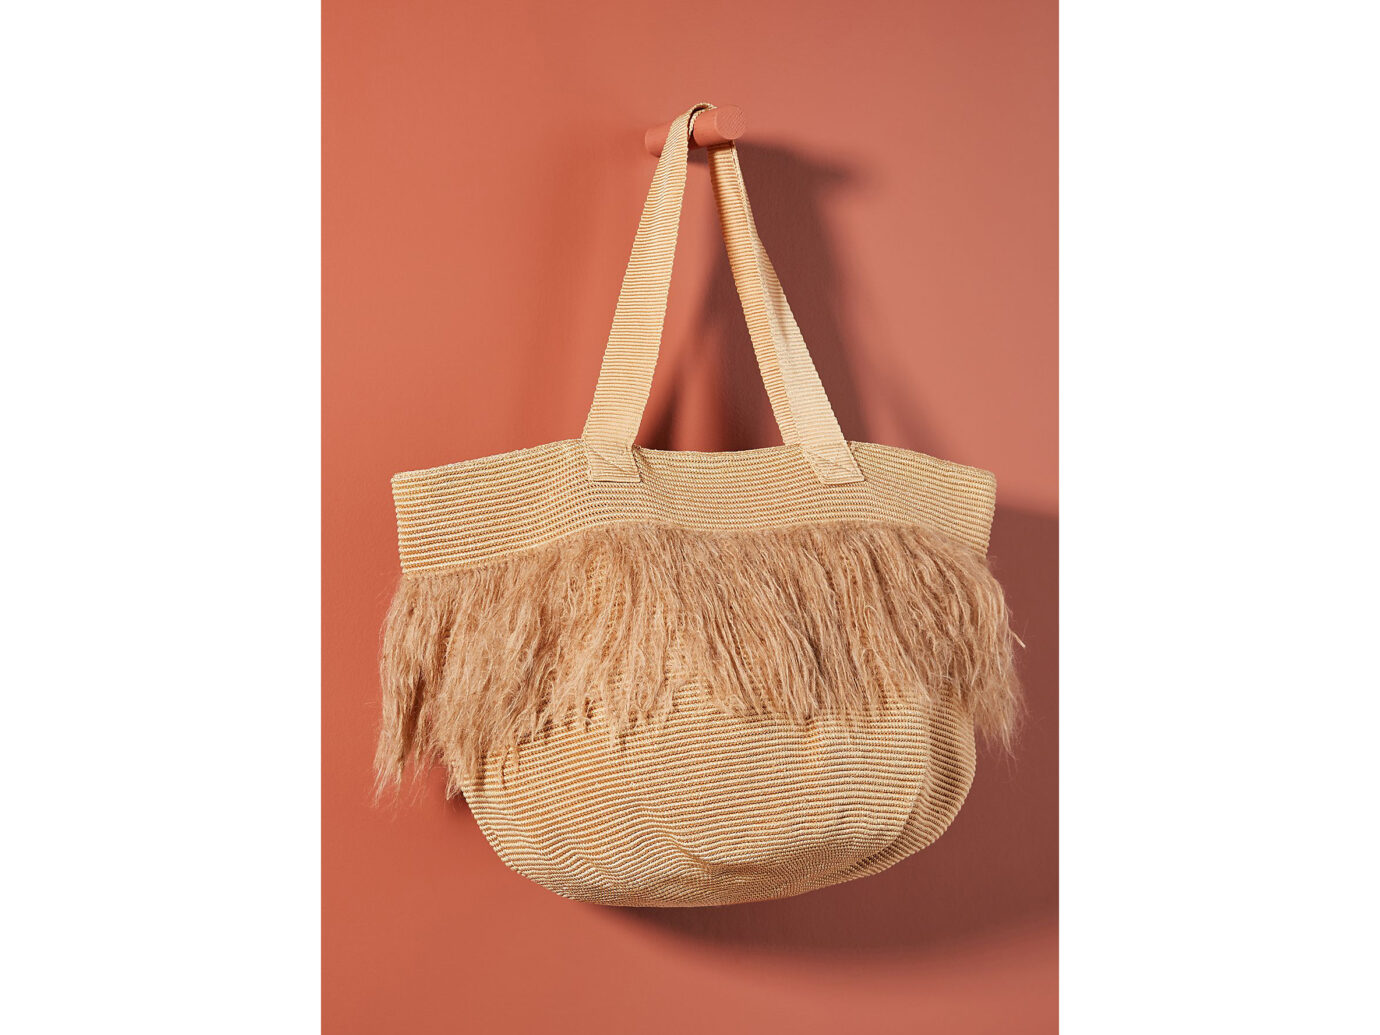 Sophie Anderson Trimmed Tote Bag